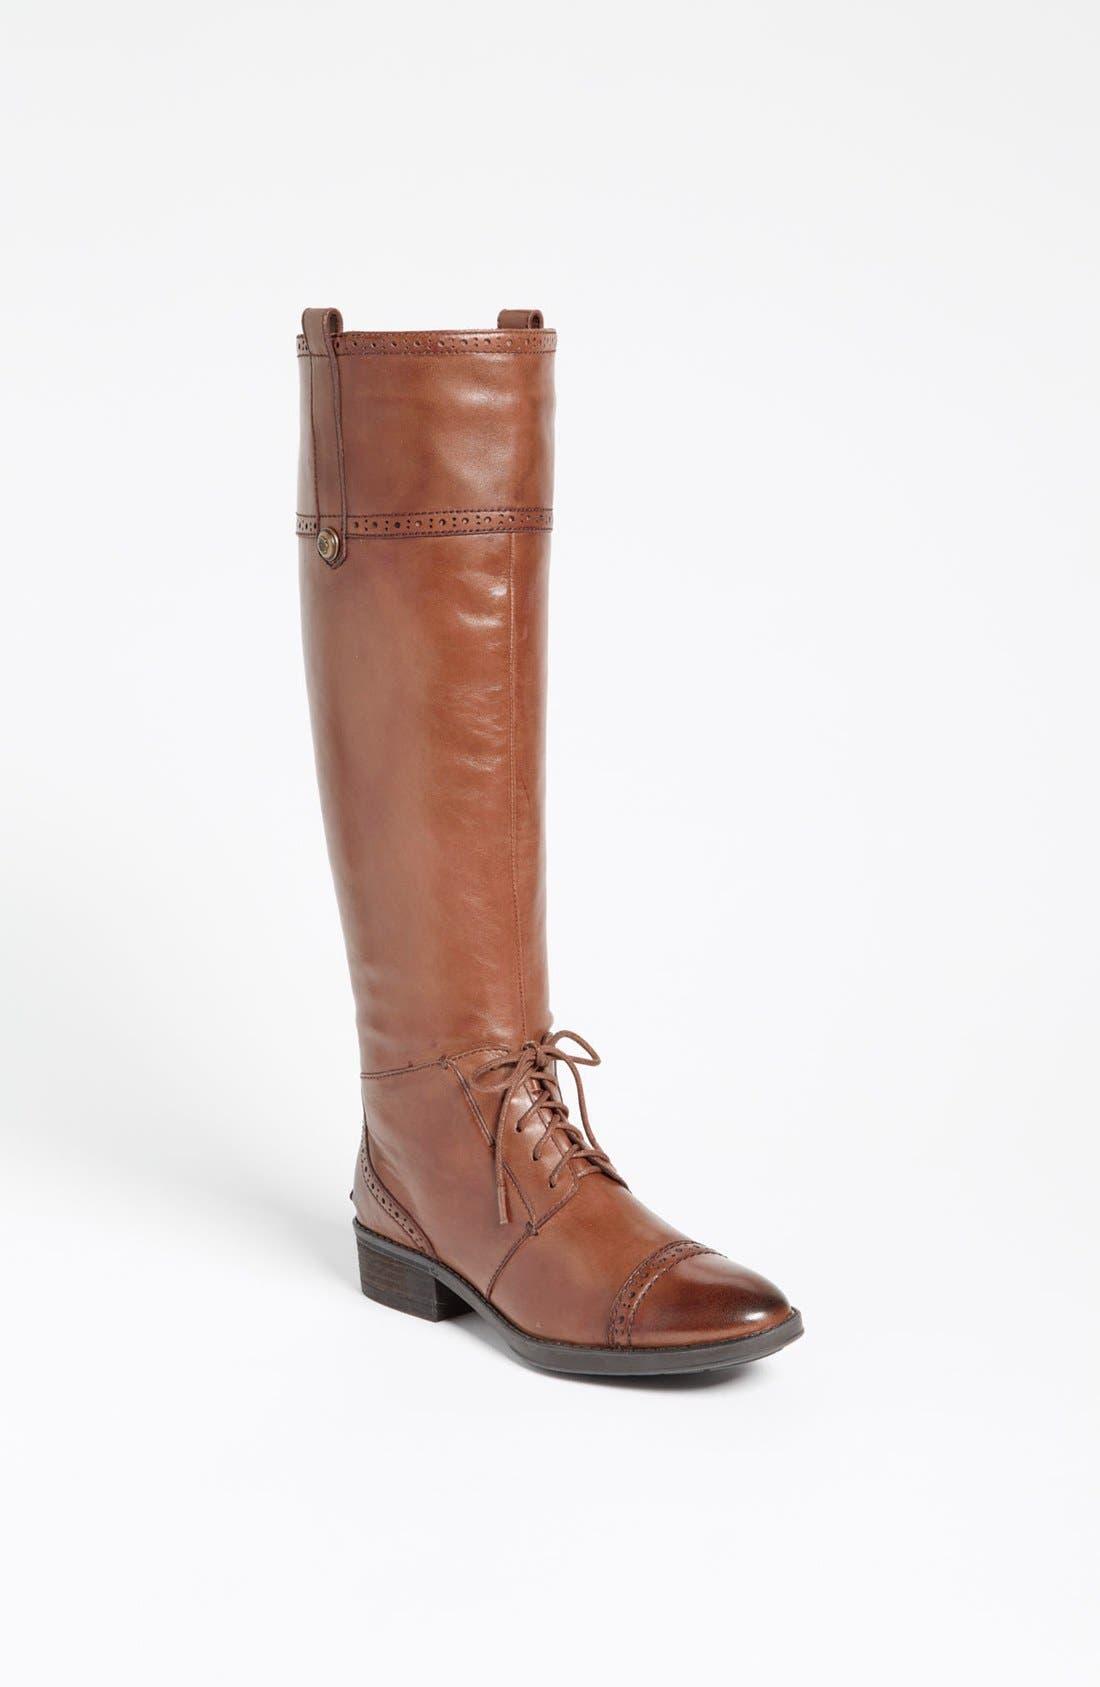 Alternate Image 1 Selected - Sam Edelman 'Perron' Boot